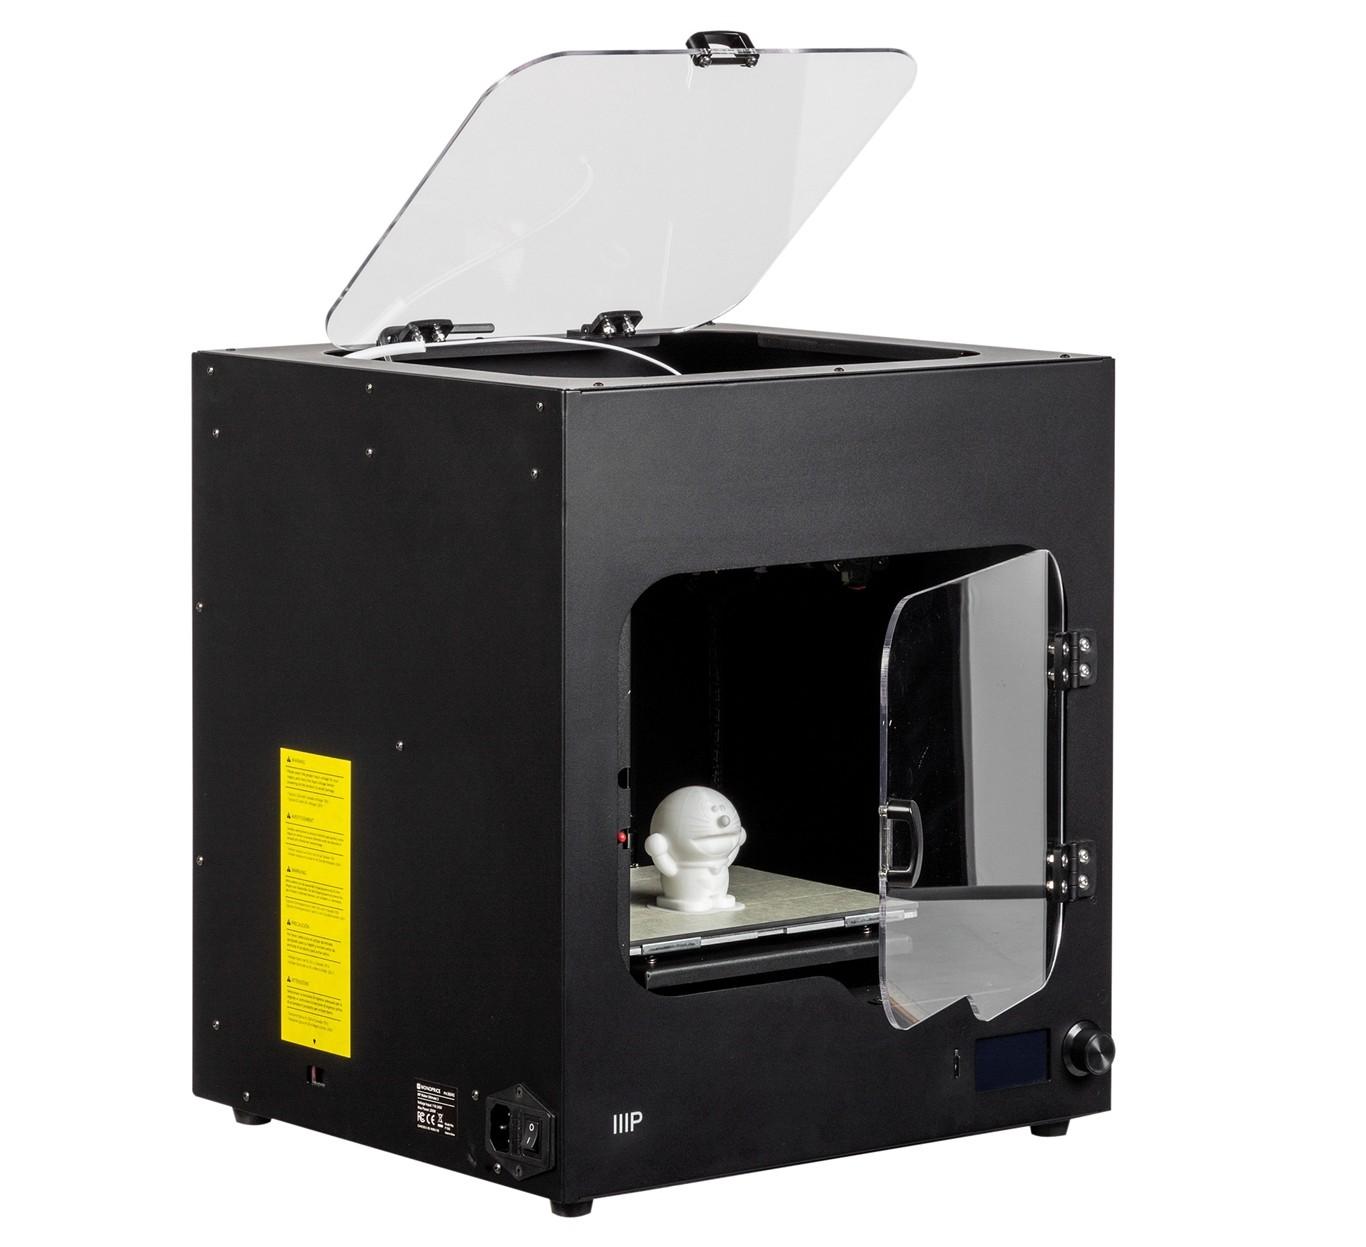 Stationäre Maschinen Monoprice Maker Ultimate 2 im Test, Bild 2